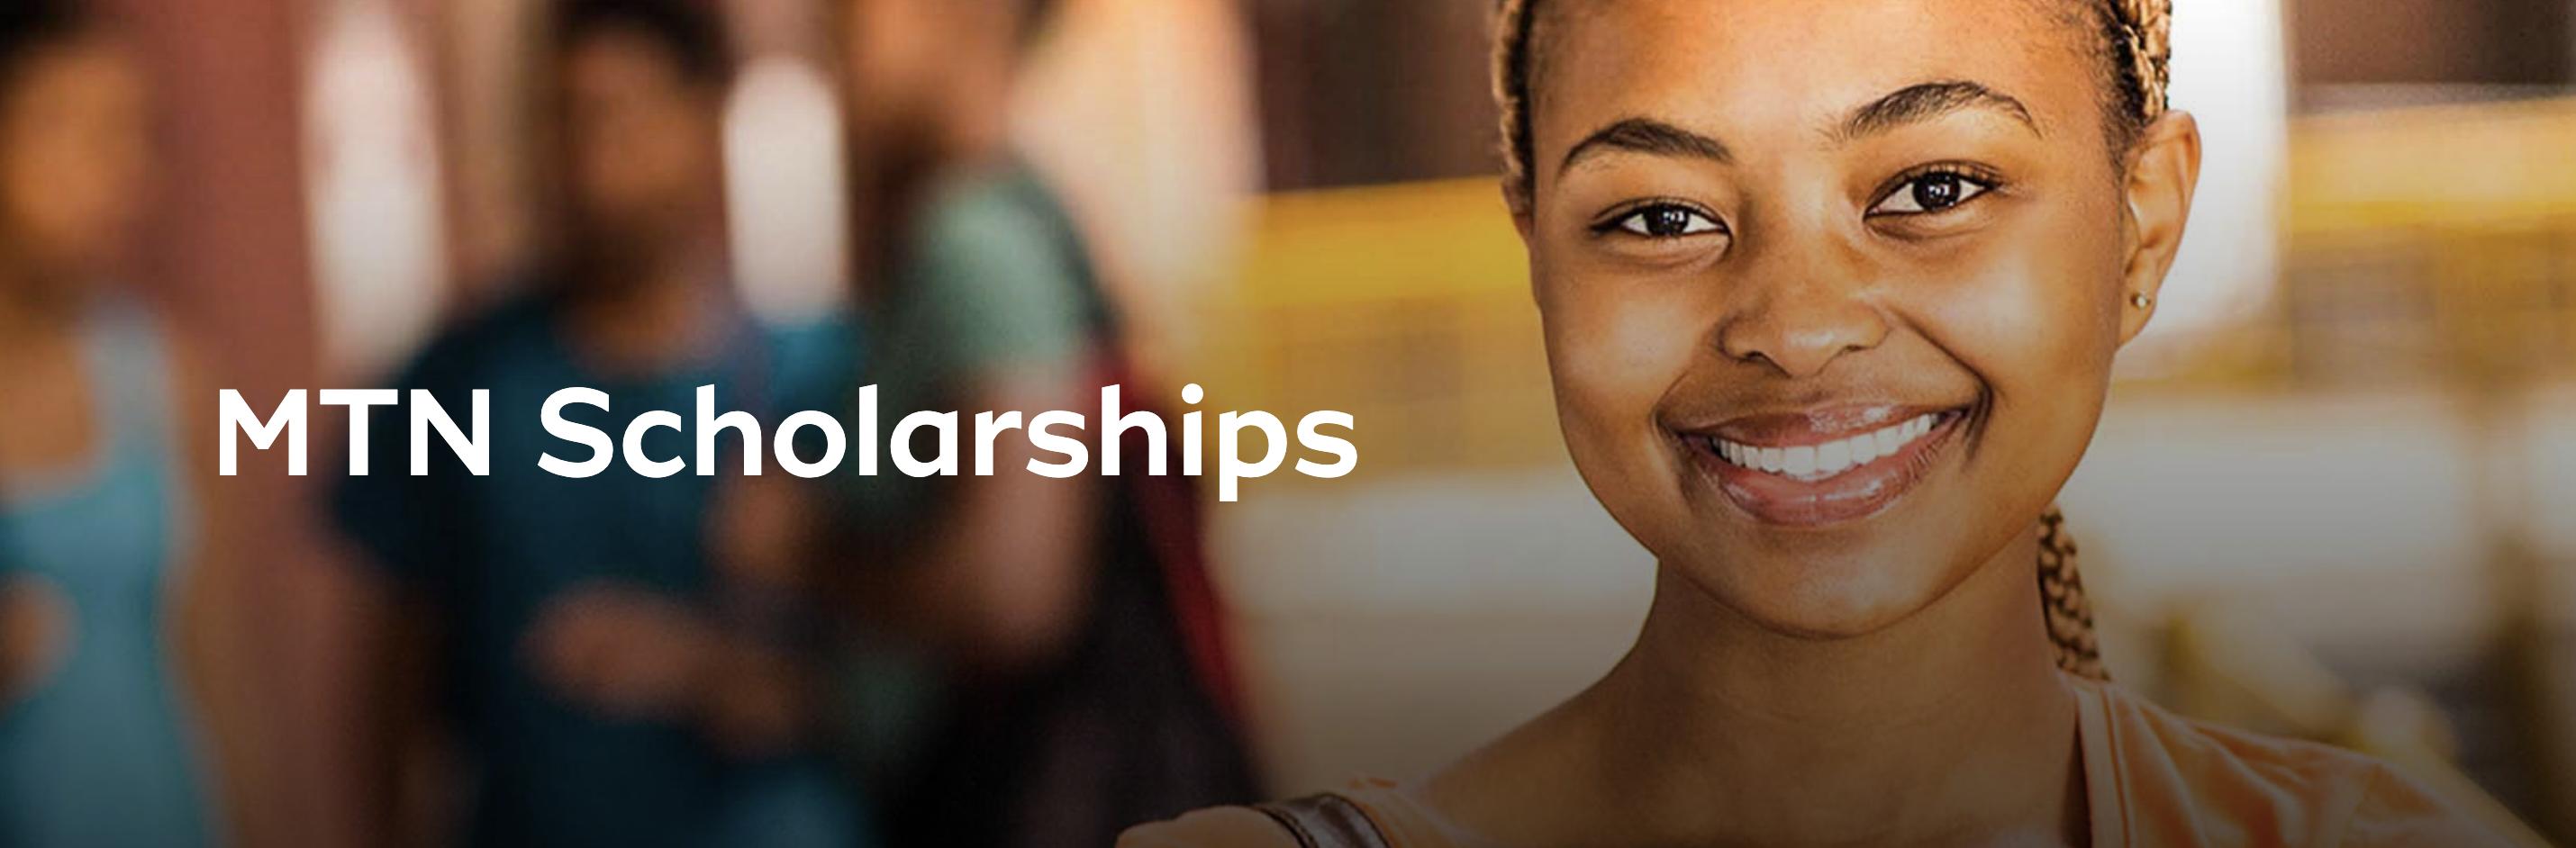 MTN Foundation Scholarship 2021/2022 for 200L Nigerian Students